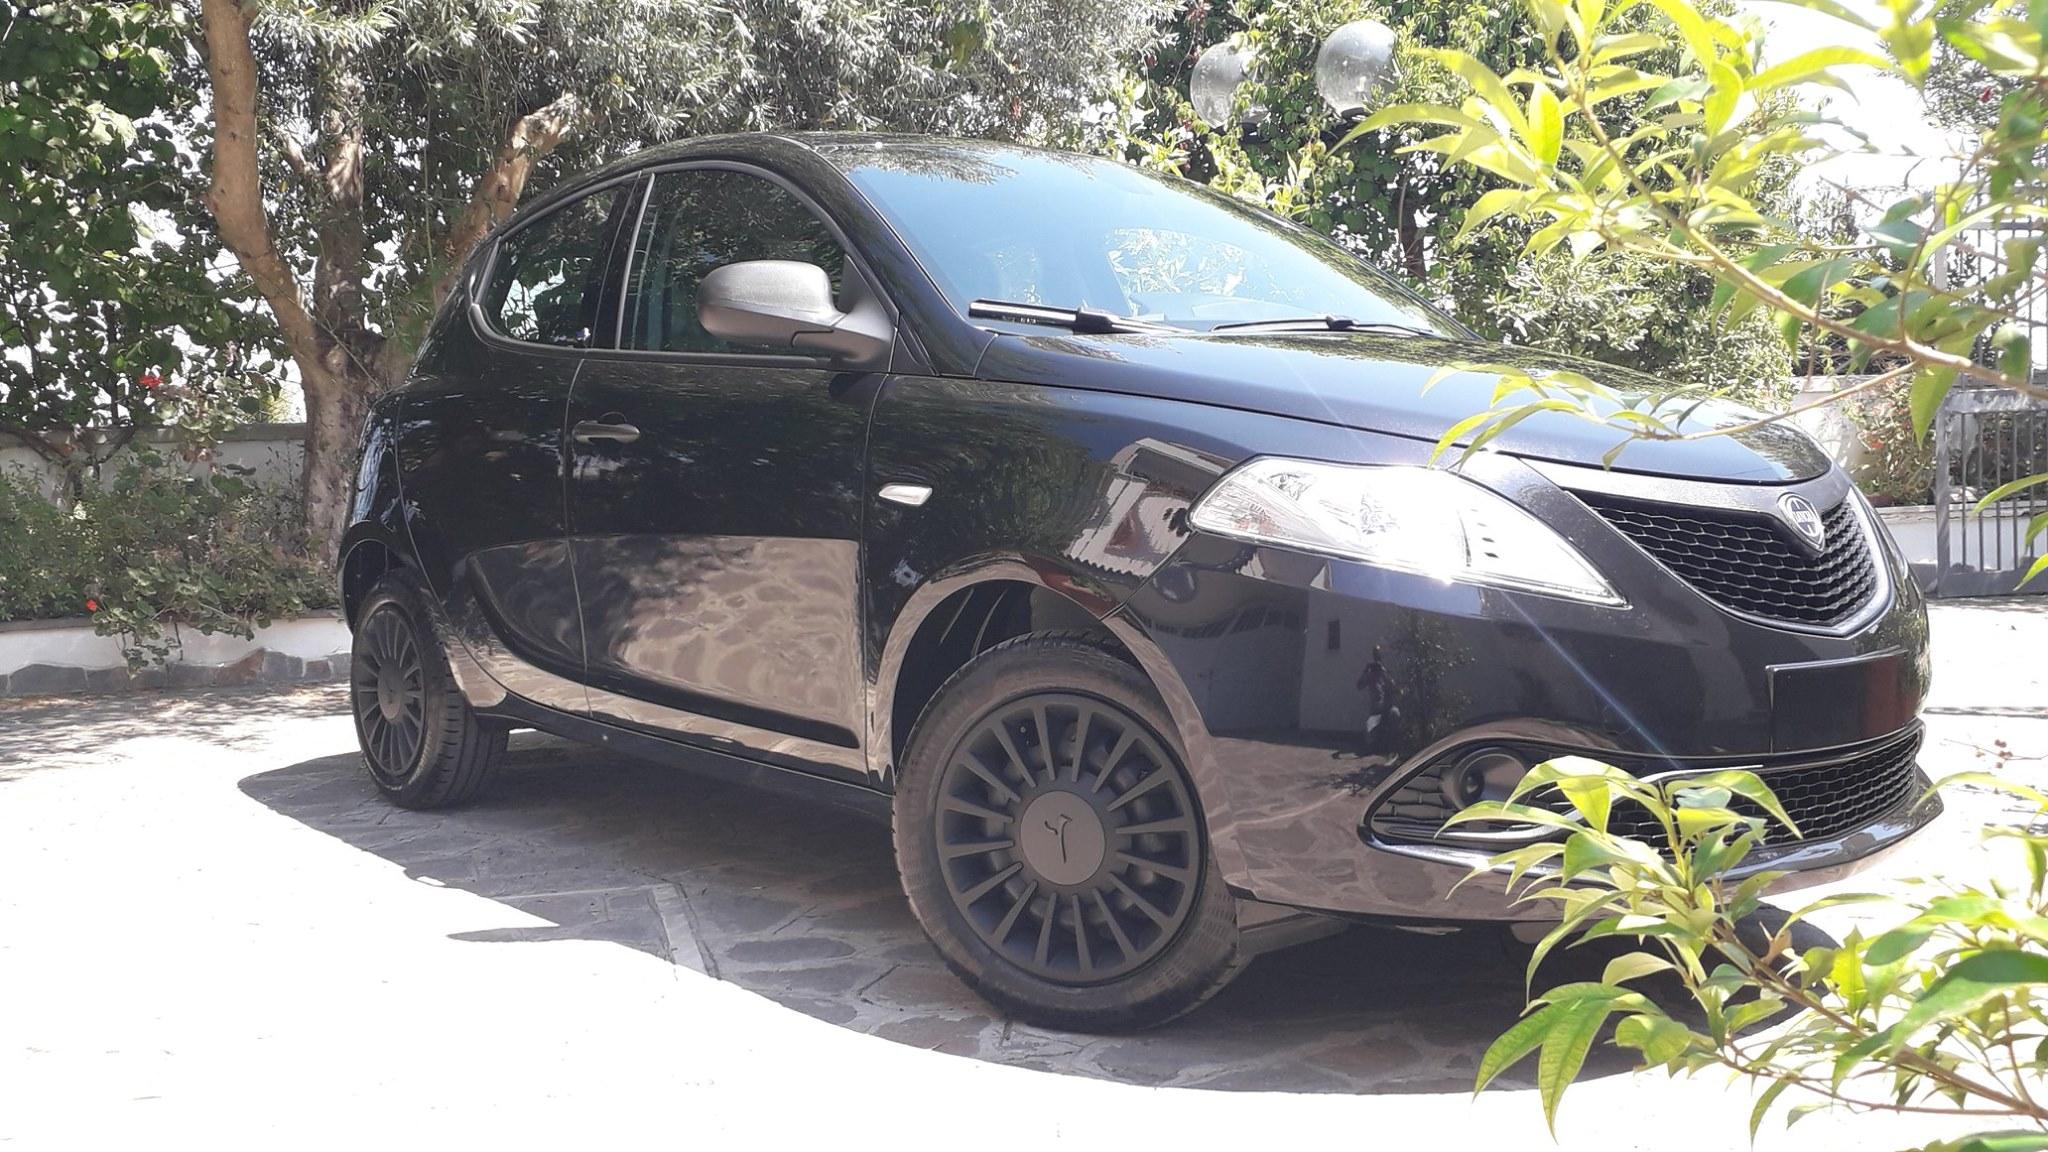 Lancia Ypsilon 1.2 69 CV S&S Euro 6d Temp, Elefantino Blu, ad Euro 10.100,00 + p.p.!